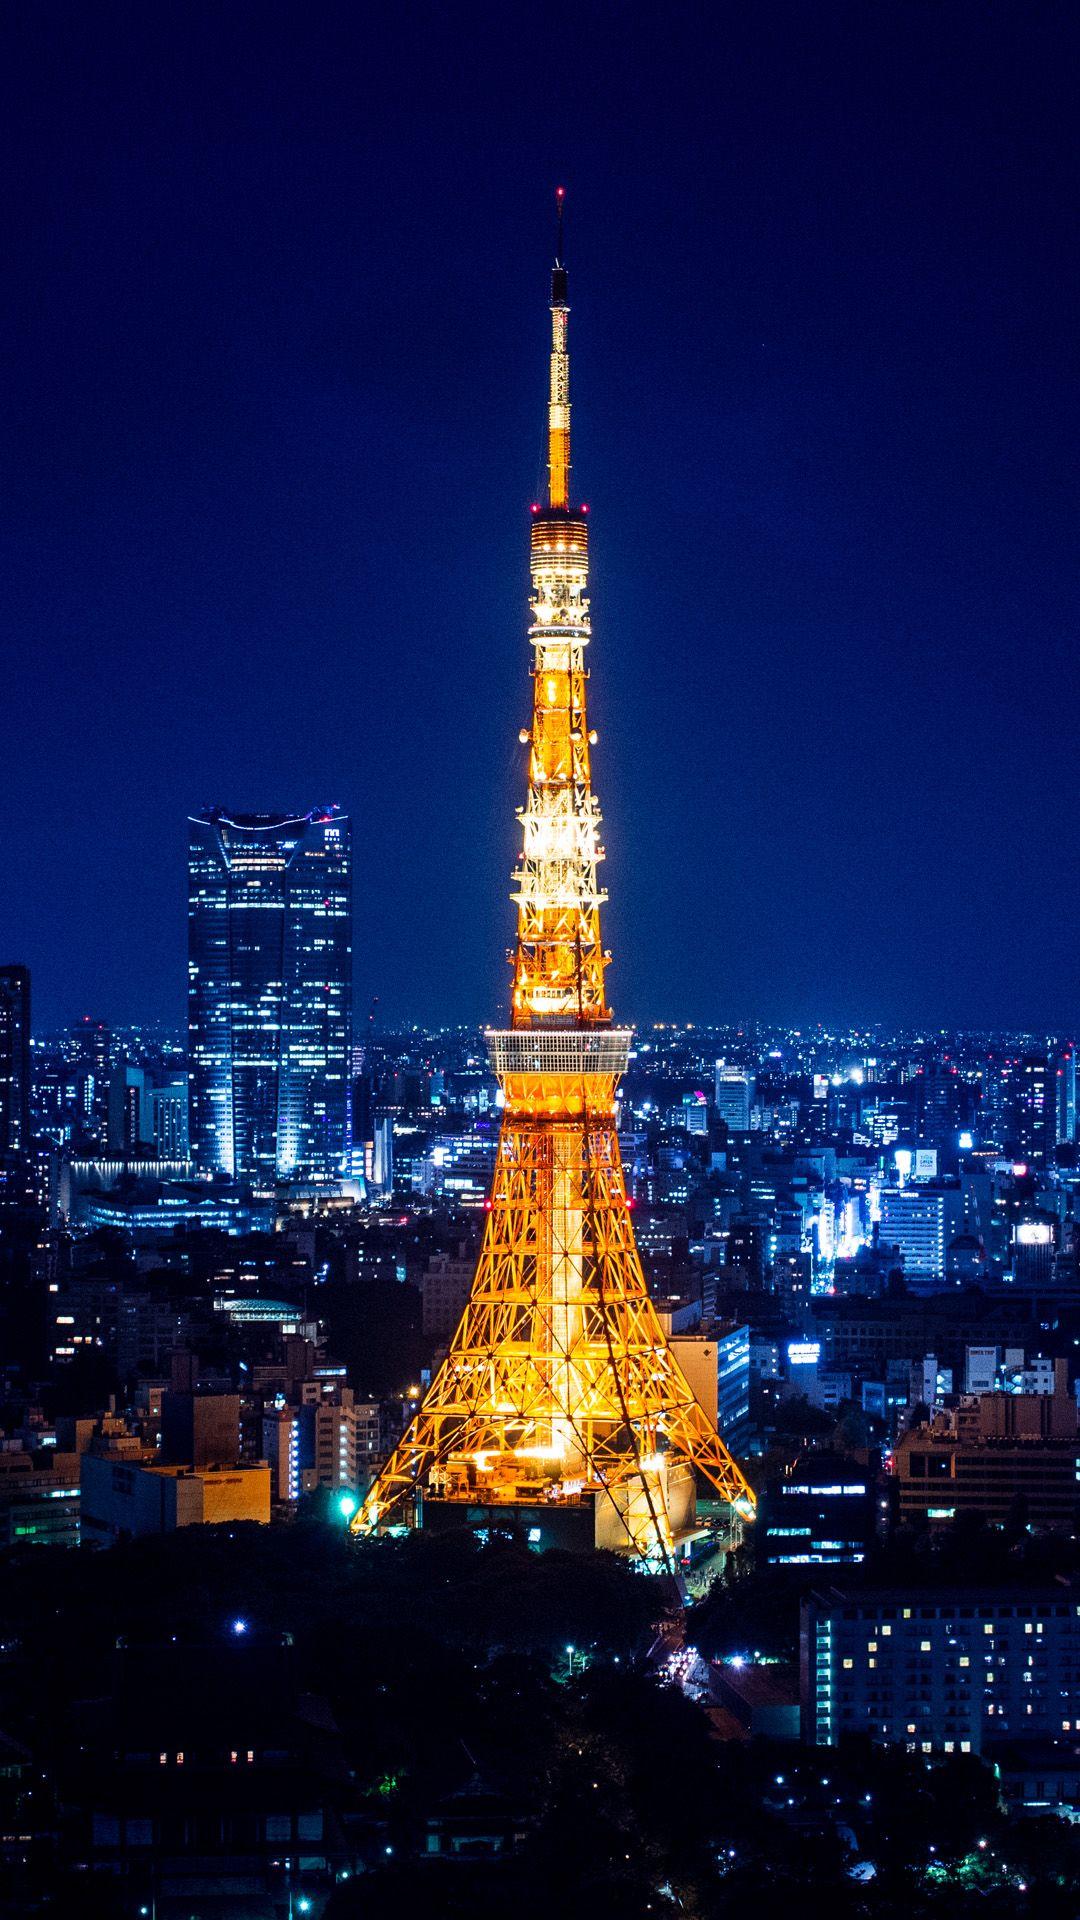 Tower Yokohama Night iphone 6 plus wallpaper iPhone 6